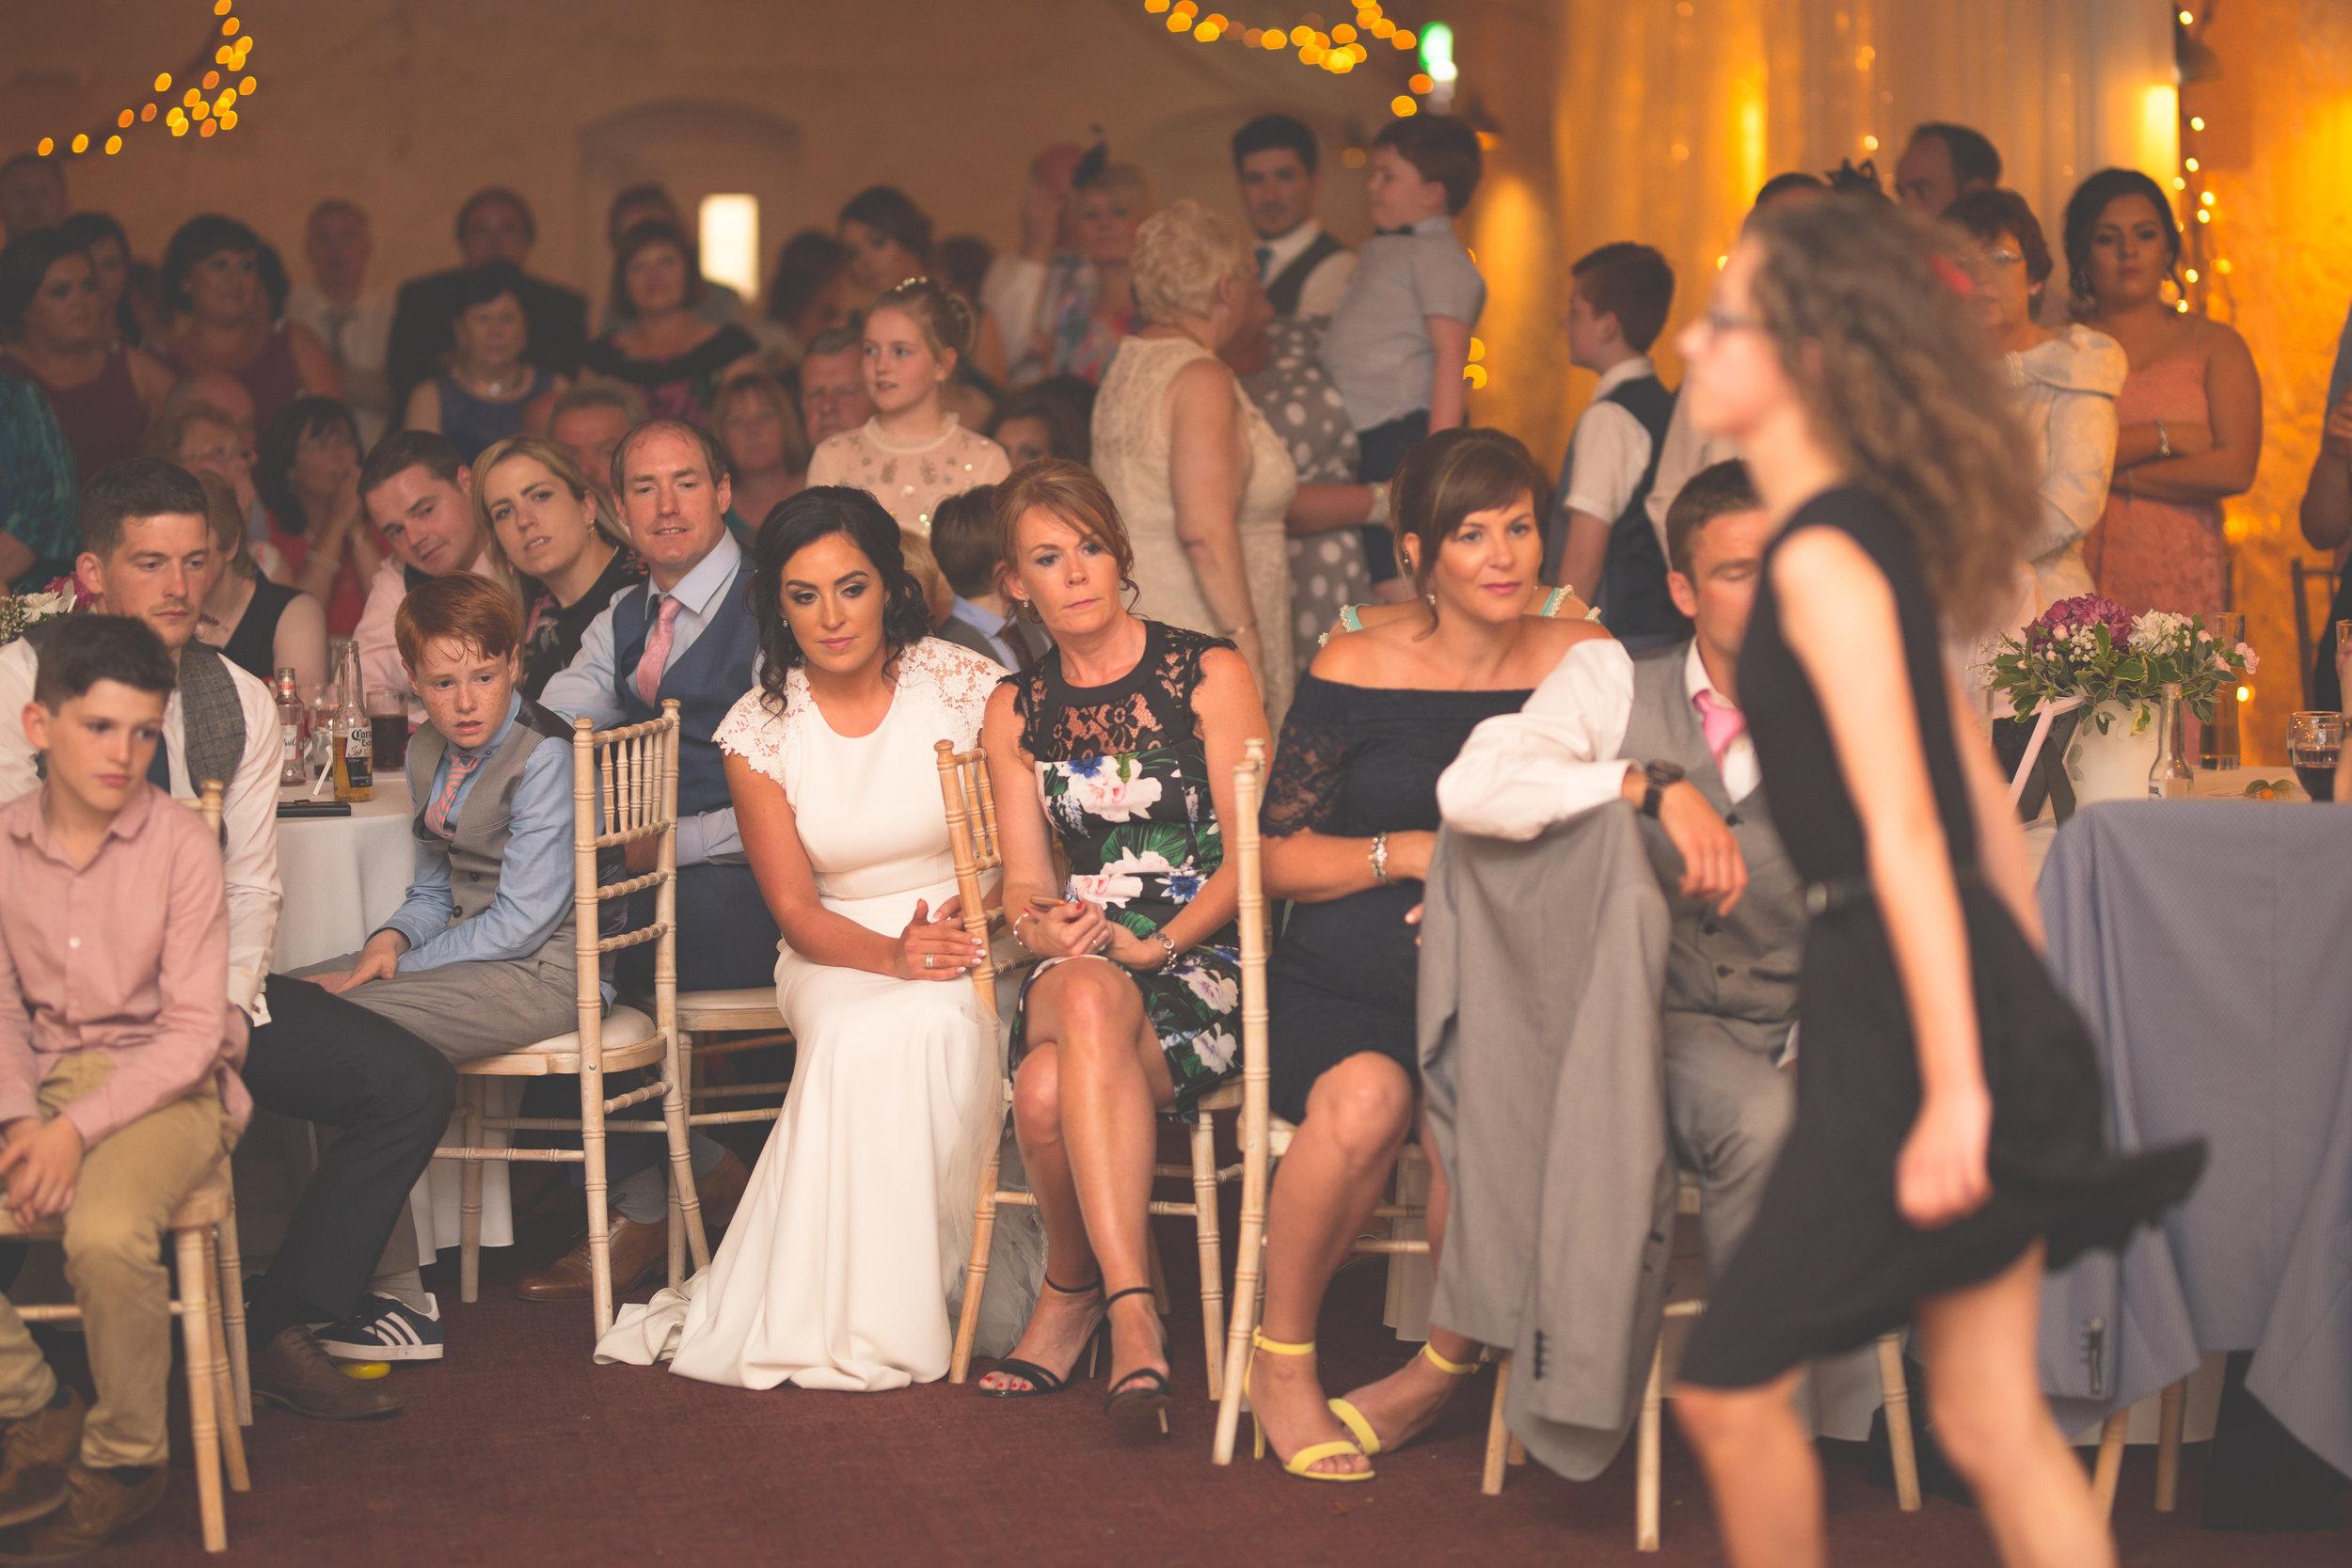 Brian McEwan Wedding Photography | Carol-Annee & Sean | The Dancing-11.jpg